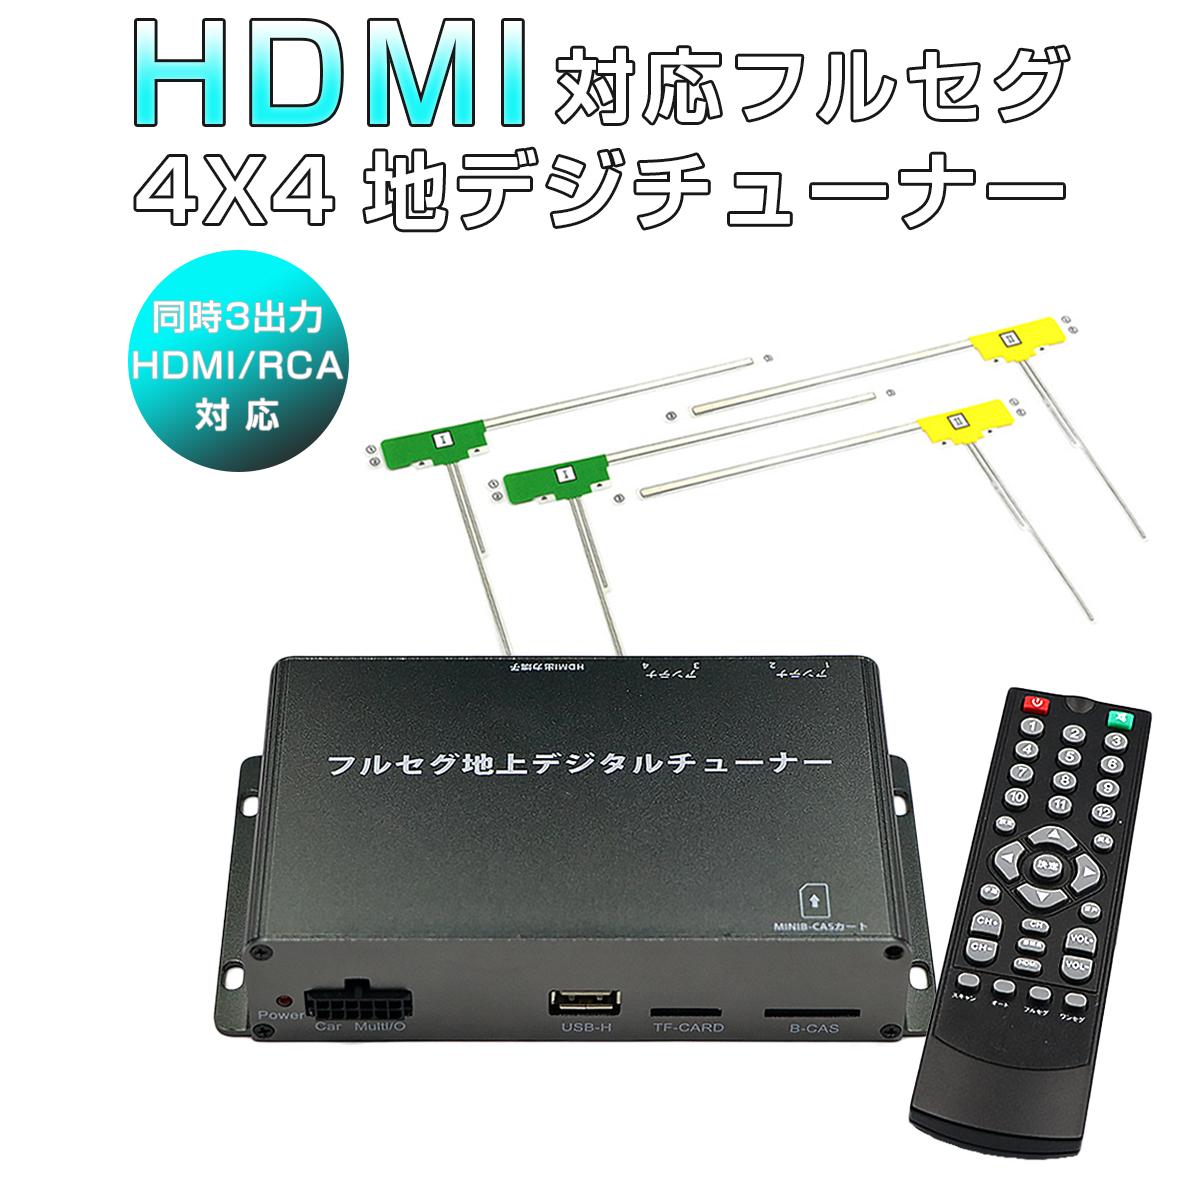 4x4 幅広いエリアで受信可能 デジタル高画質 HDMIで高画質視聴可能 HDMI RCA トレンド 電源マルチRCA同時出力可能 自動切替 受信可能最高速度:150km h カーナビ NISSAN クリッパー トラック 地デジチューナー 古い車載TVやカーナビにも使える フルセグ 24V ワンセグ 高性能 4チューナー 自動切換 12V 1年保証 お得なキャンペーンを実施中 4アンテナ 高画質 150km miniB-CASカード付き hまで受信 フィルムアンテナ